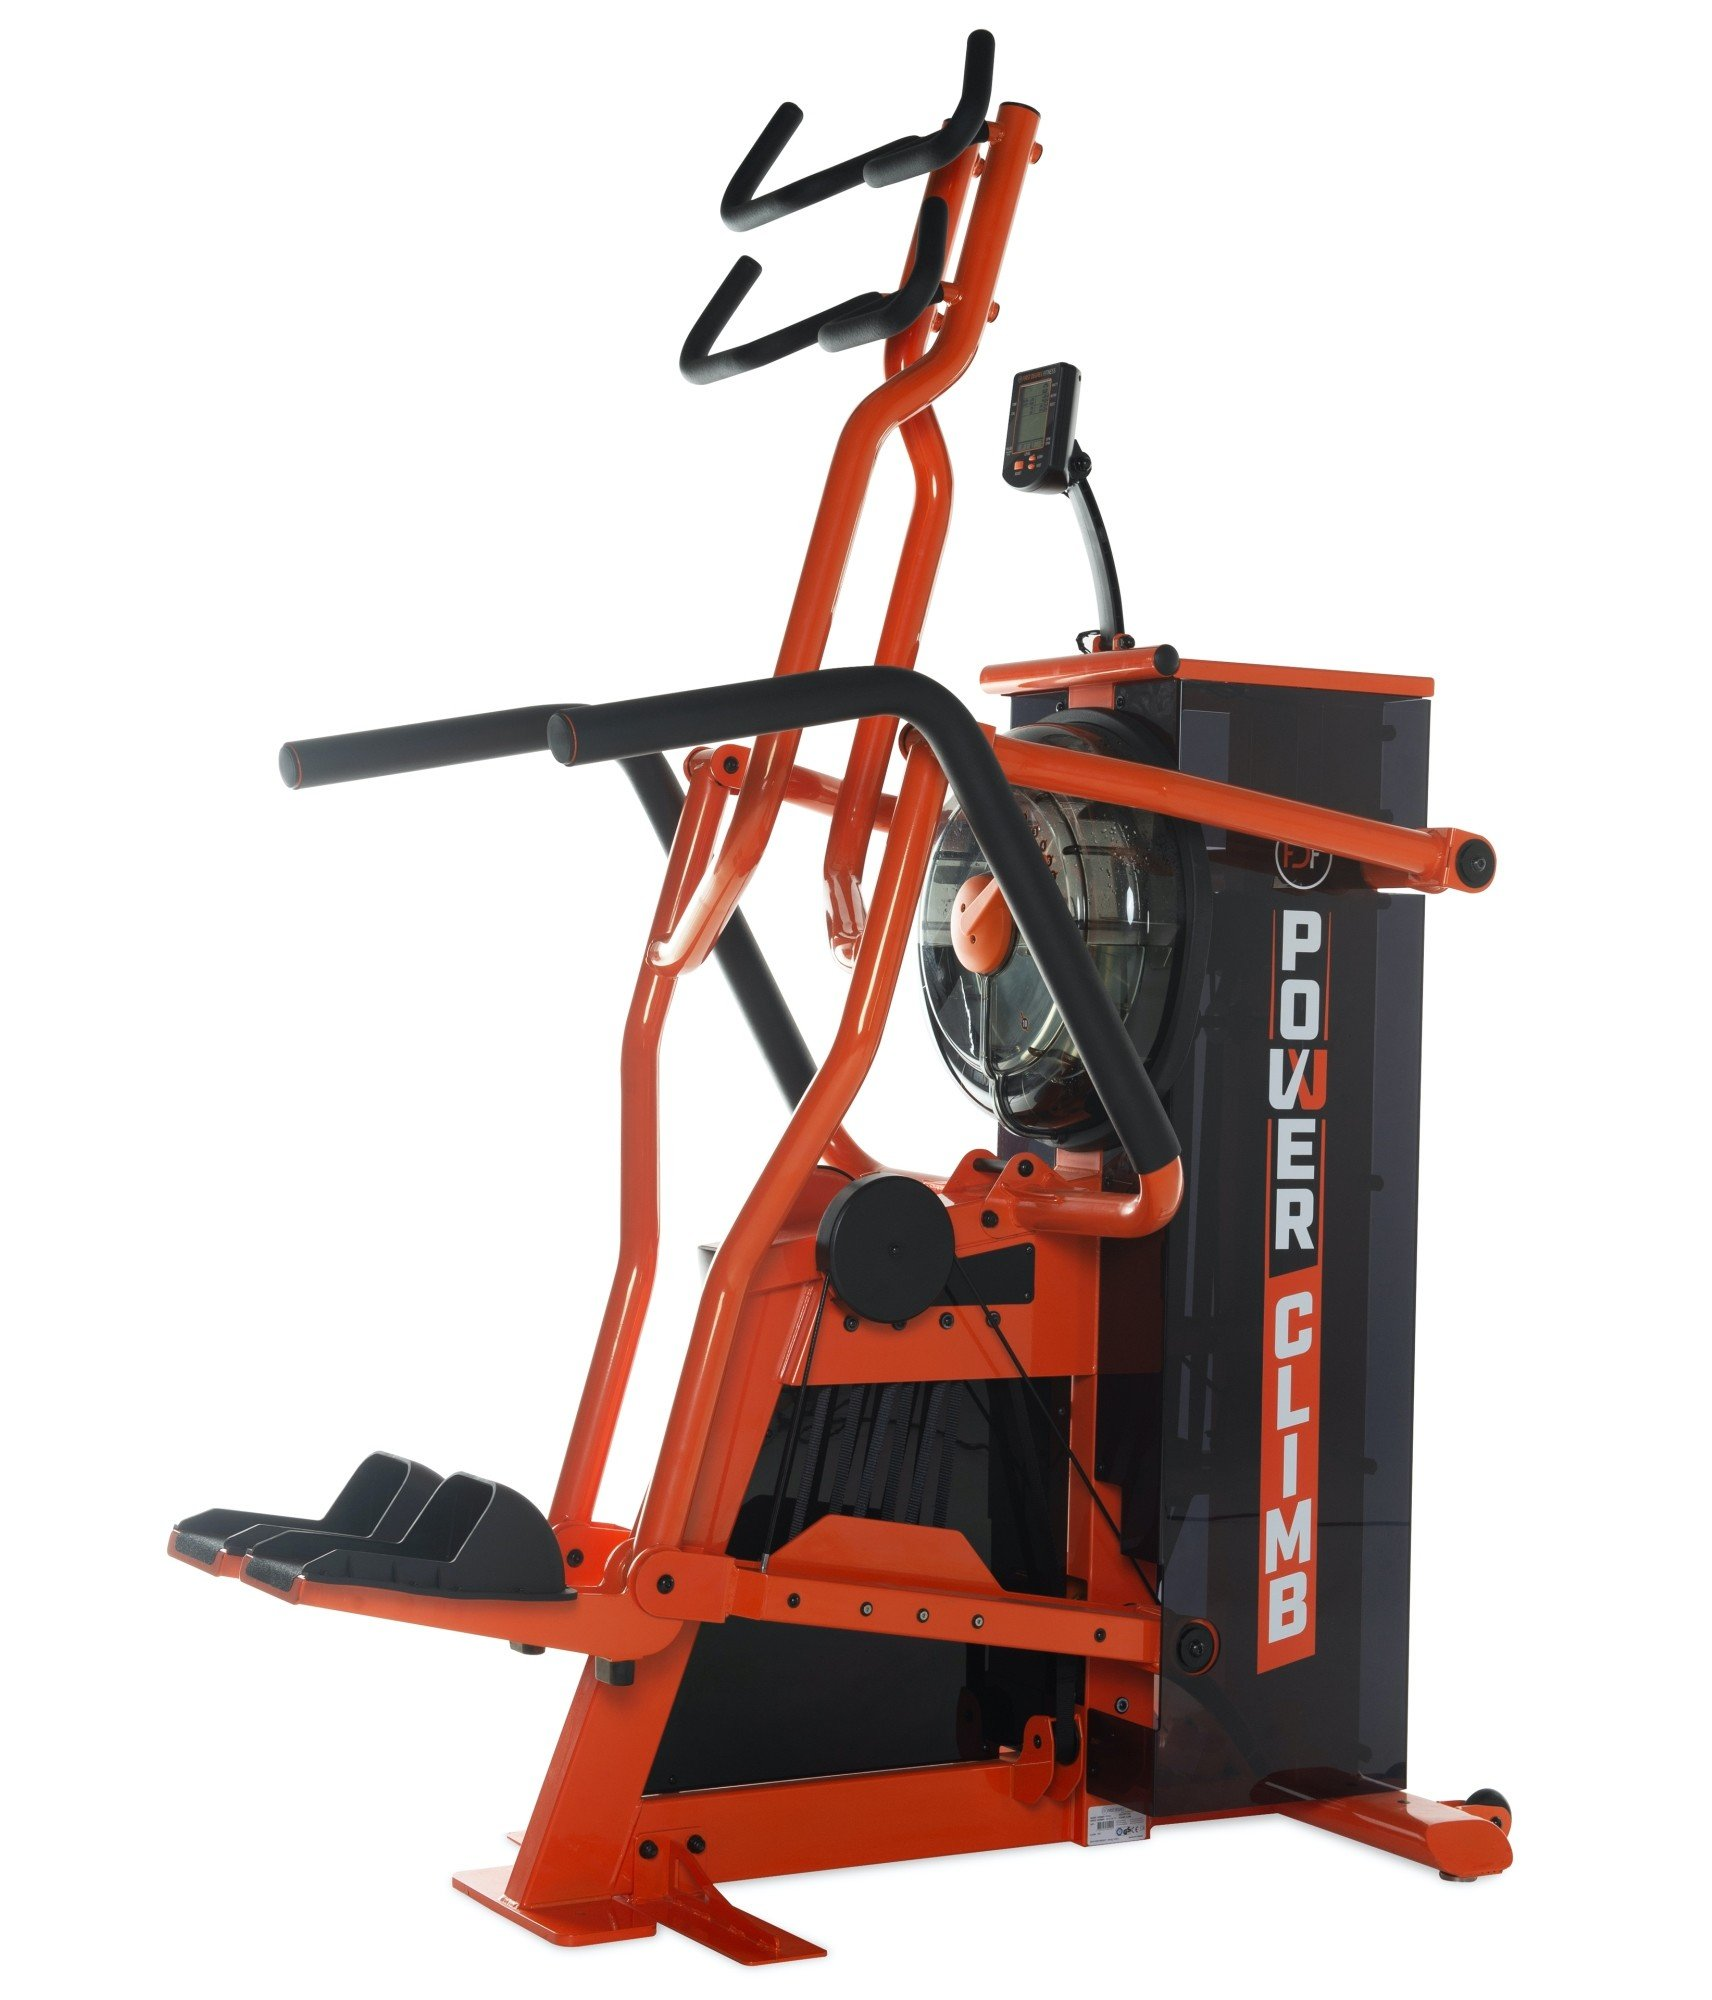 Afbeelding van First Degree PowerZone Climb - oranje